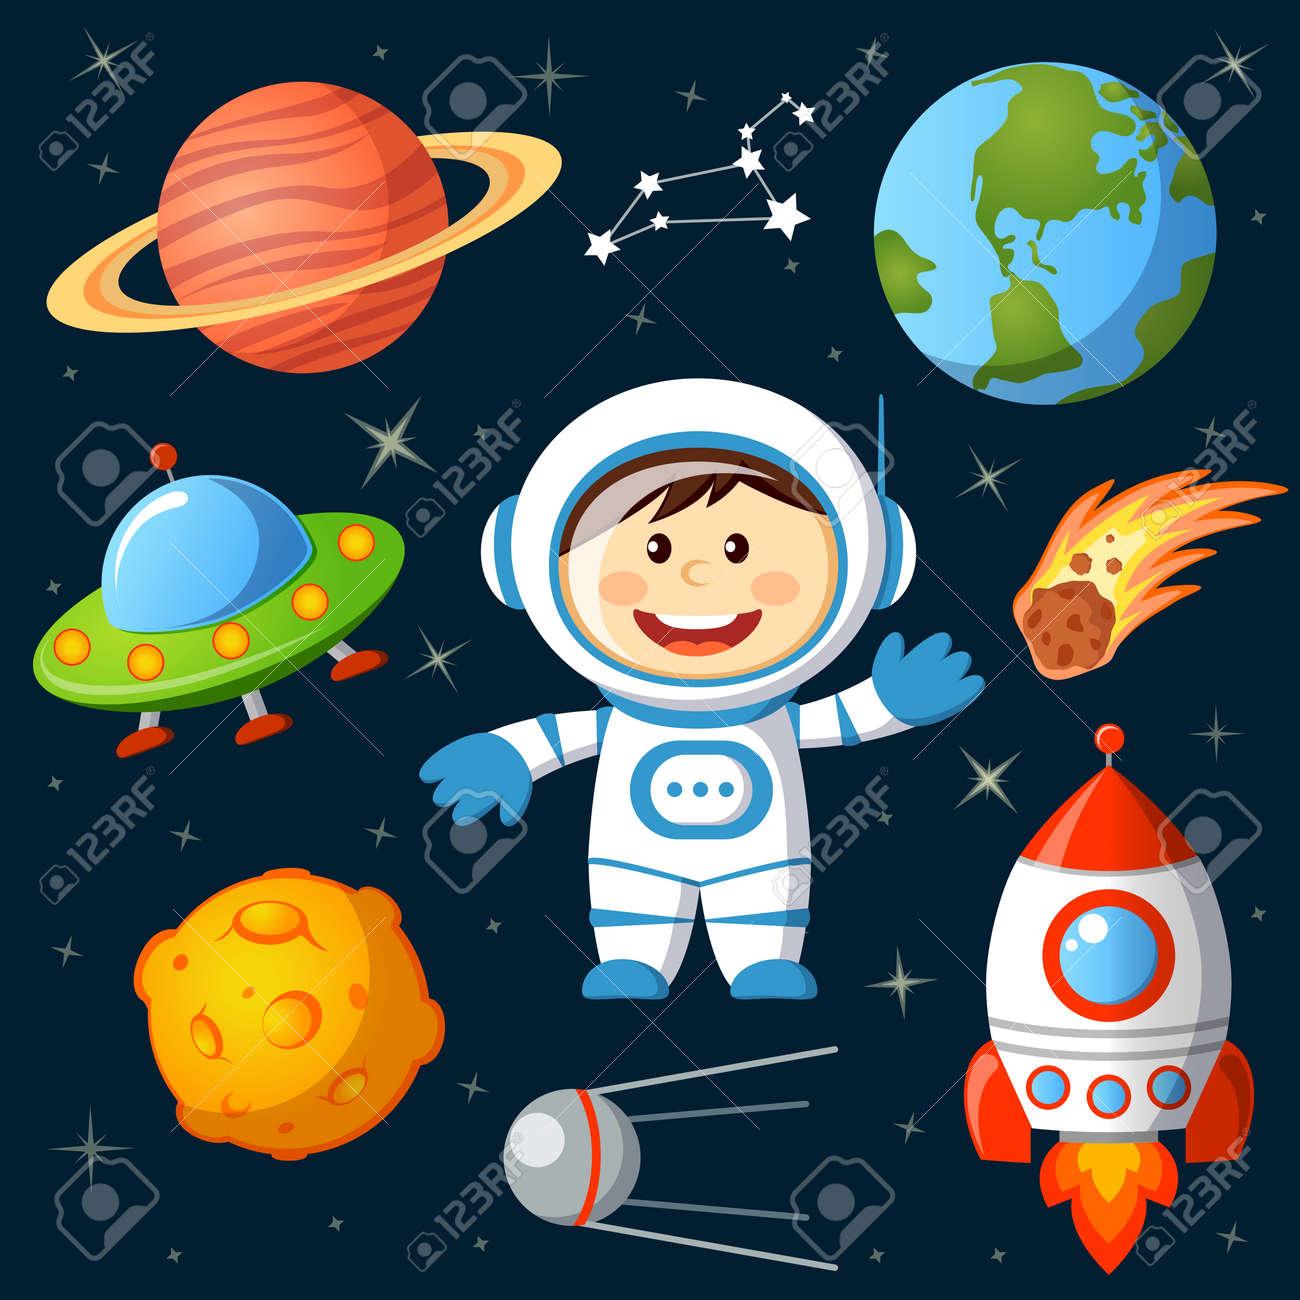 Set of space elements. Astronaut, Earth, saturn, moon, UFO, rocket, comet, constellation, sputnik and stars - 52817933